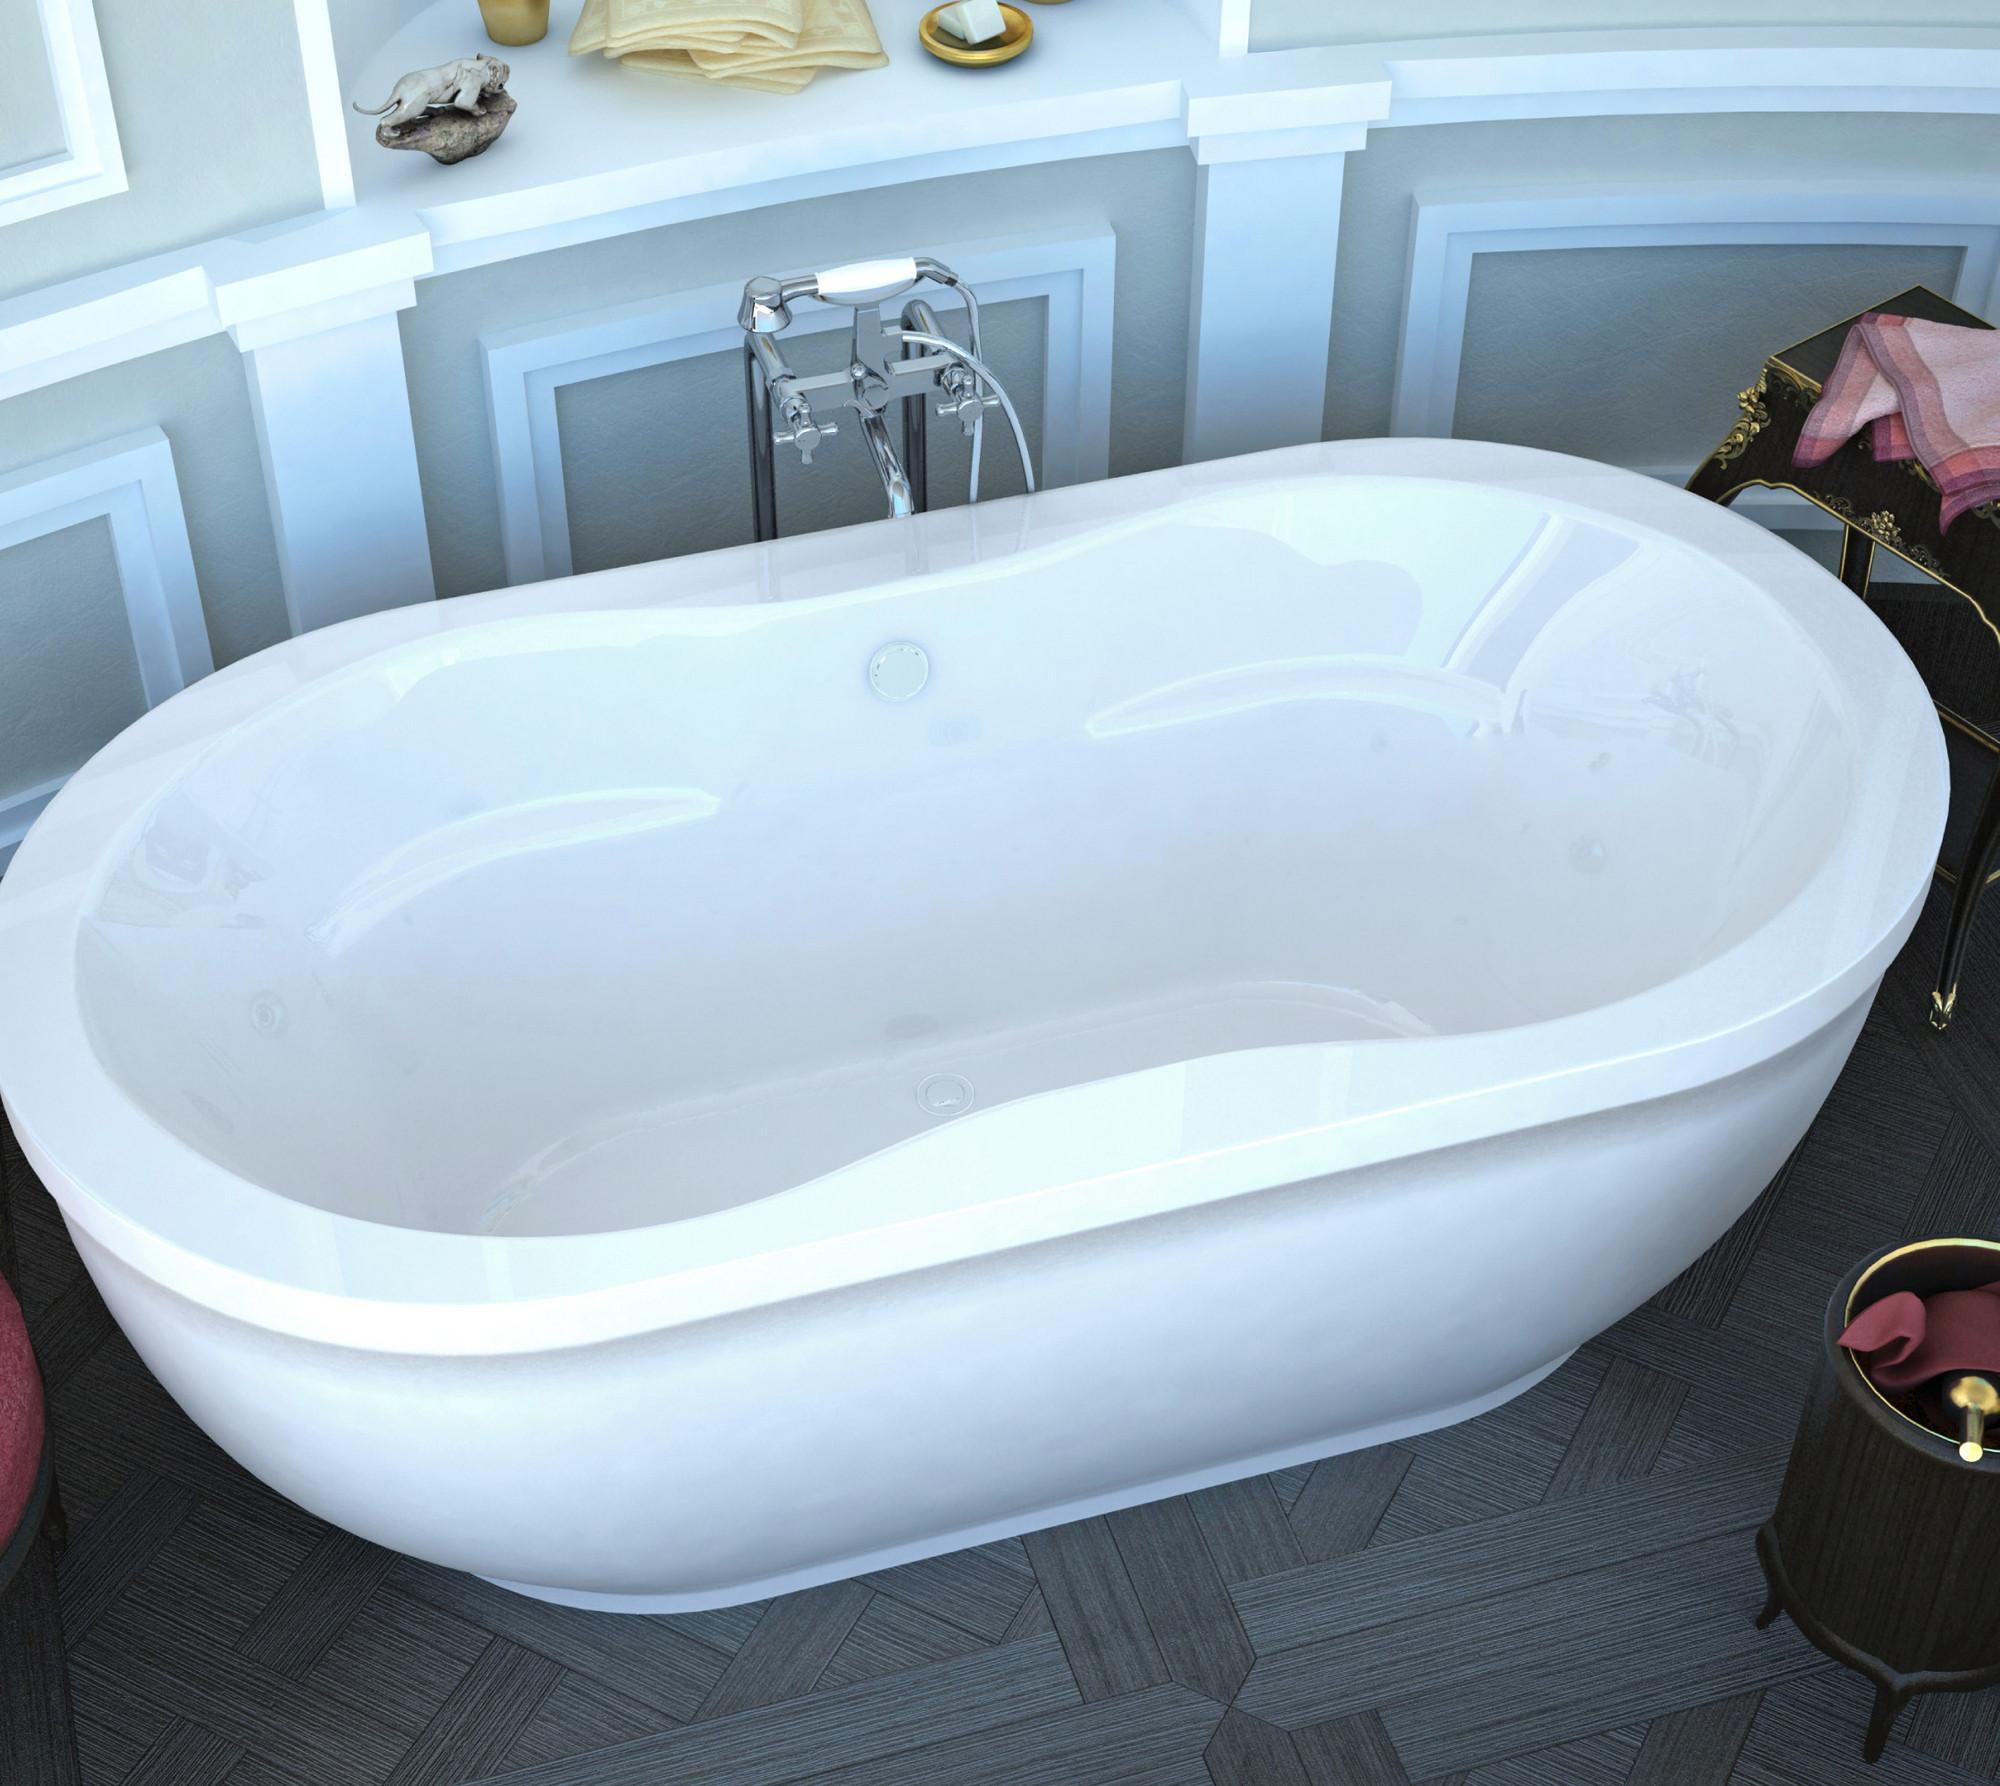 MediTub 3471AS Atlantis Embrace 34 x 71 Oval Freestanding Soaker Bathtub